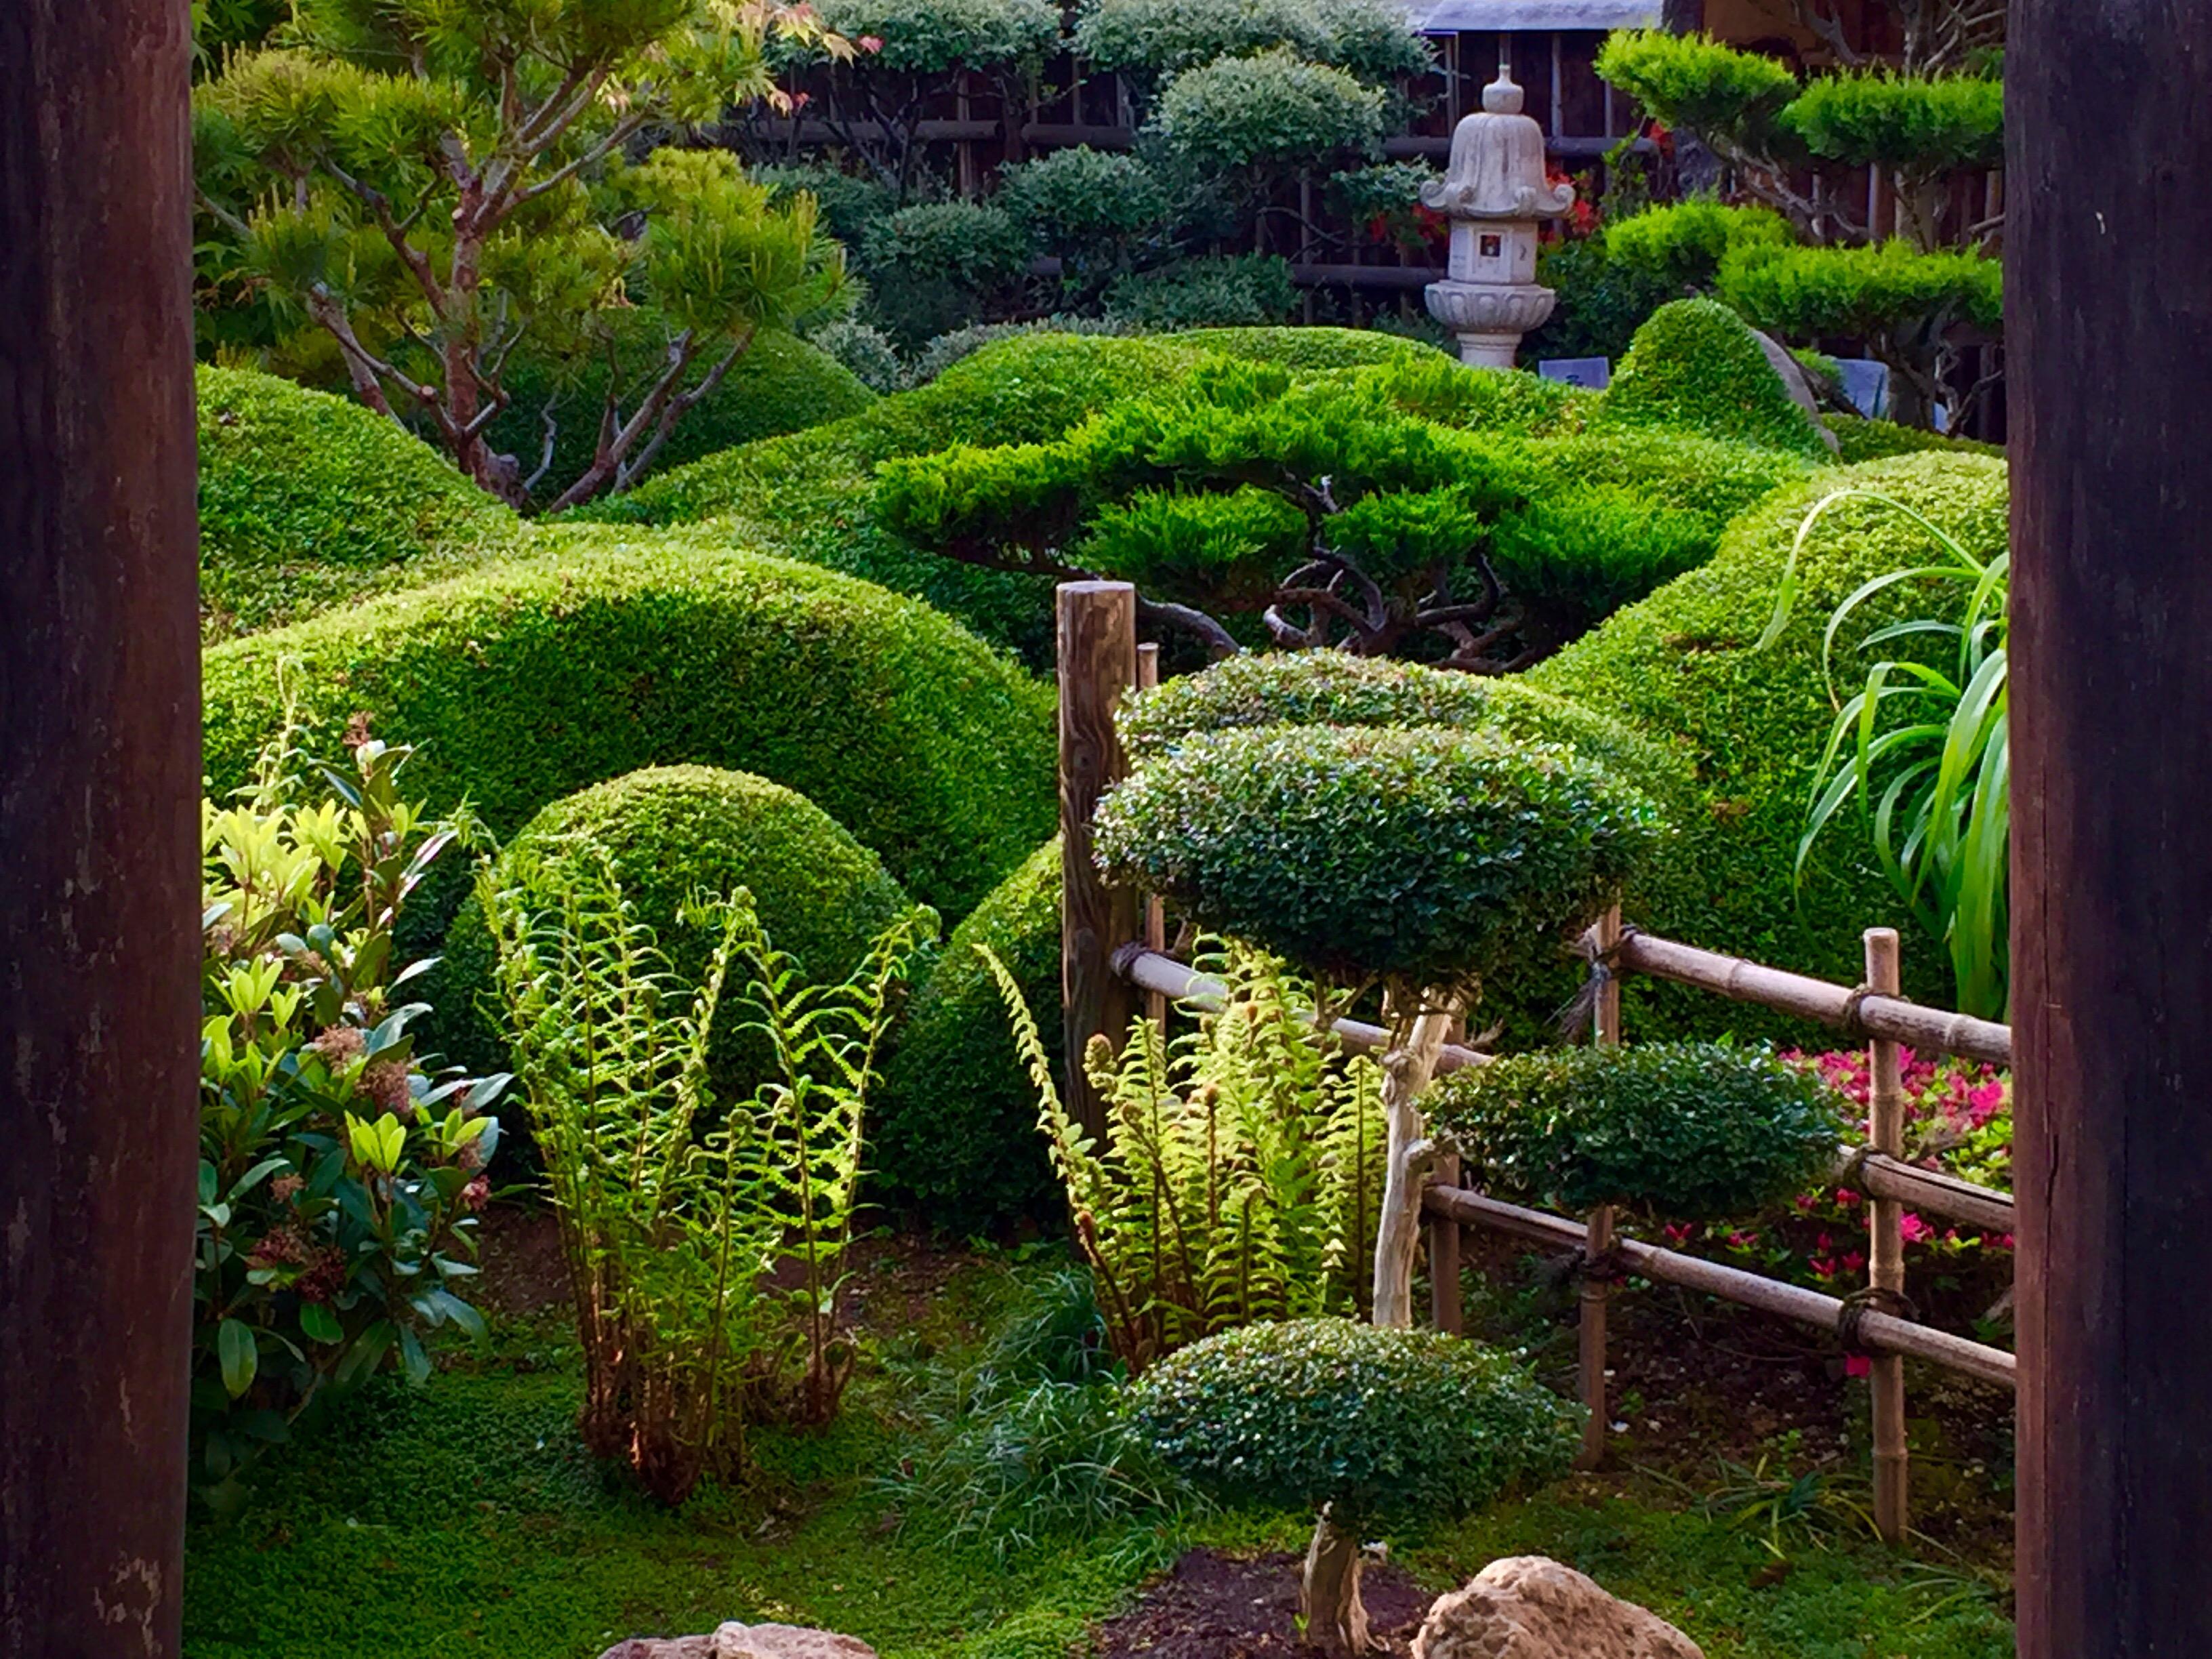 Jardin Mineral Zen Photo esprit zen kindle - bengali adventure books pdf free download